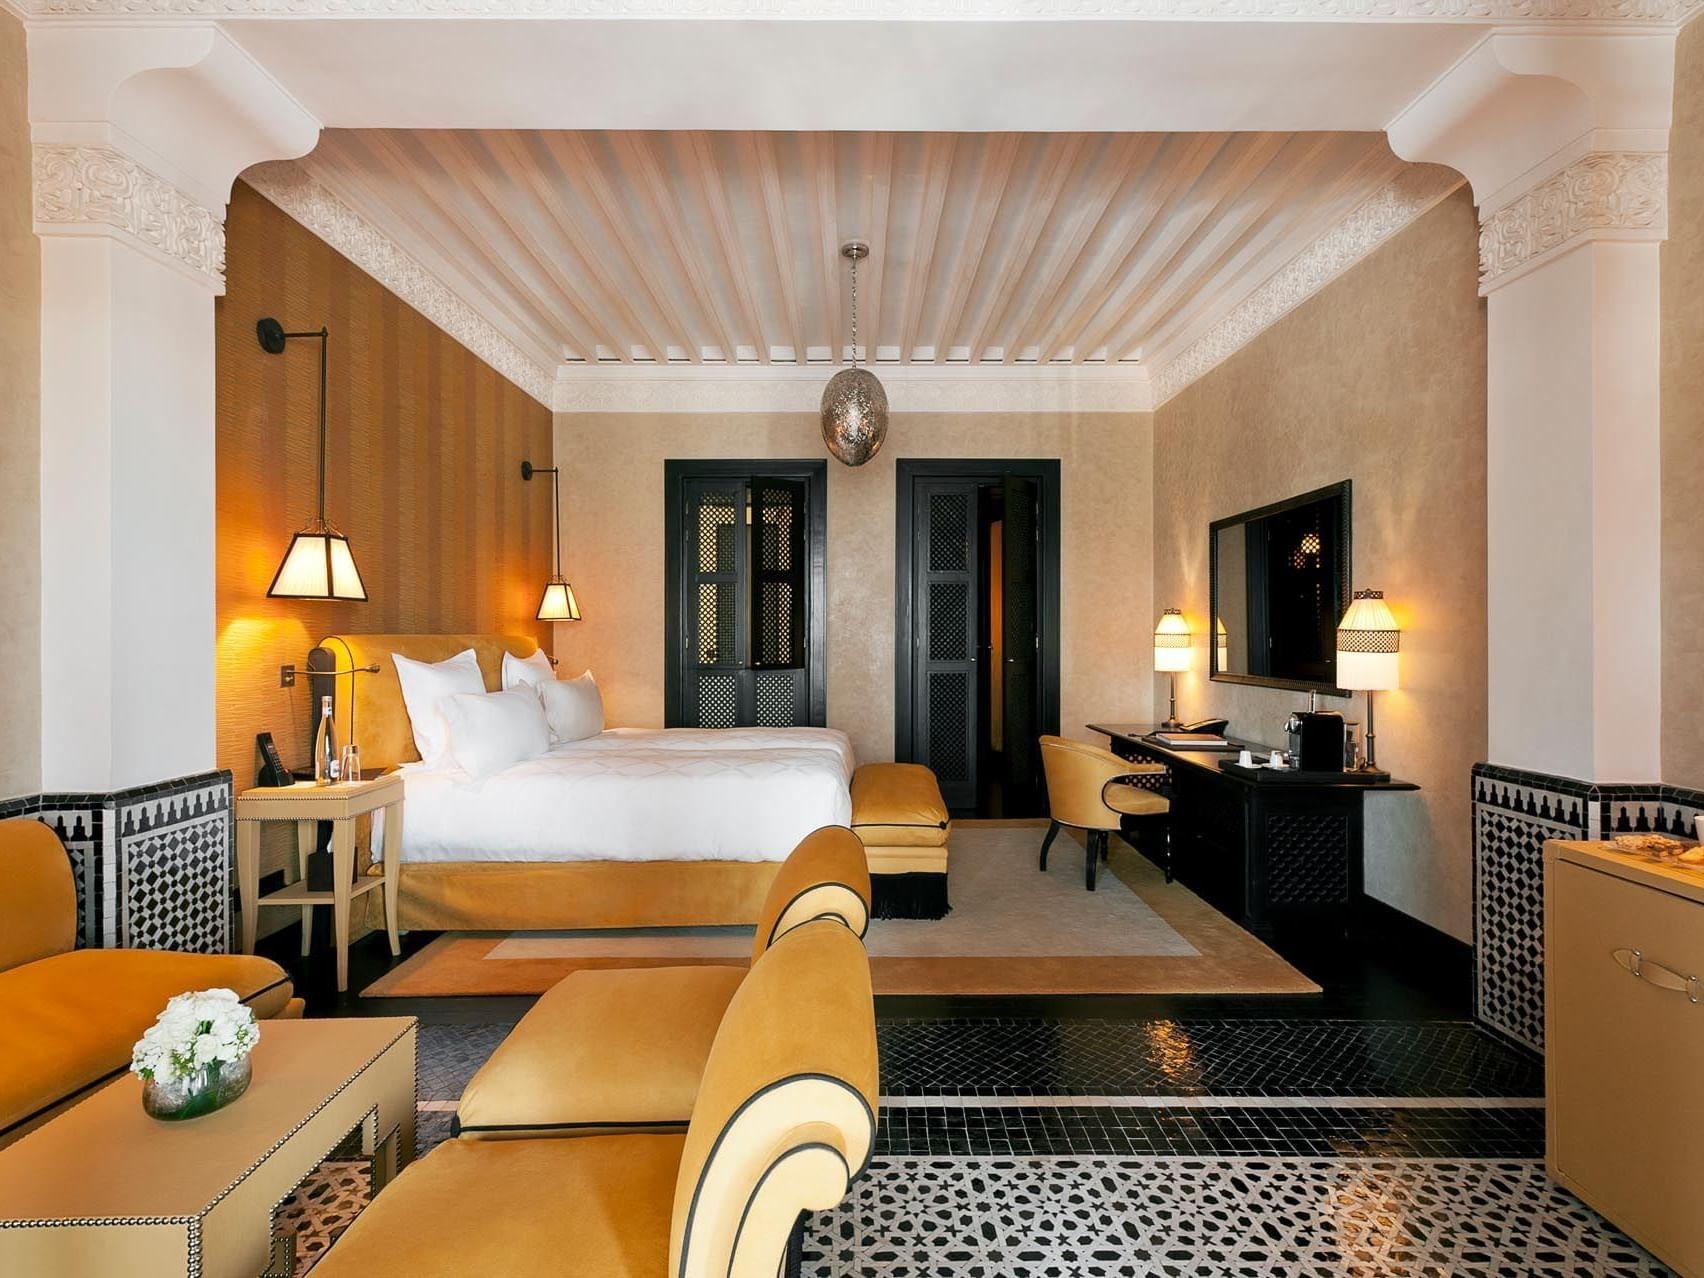 Superior Room at Selman Marrakech Hotel